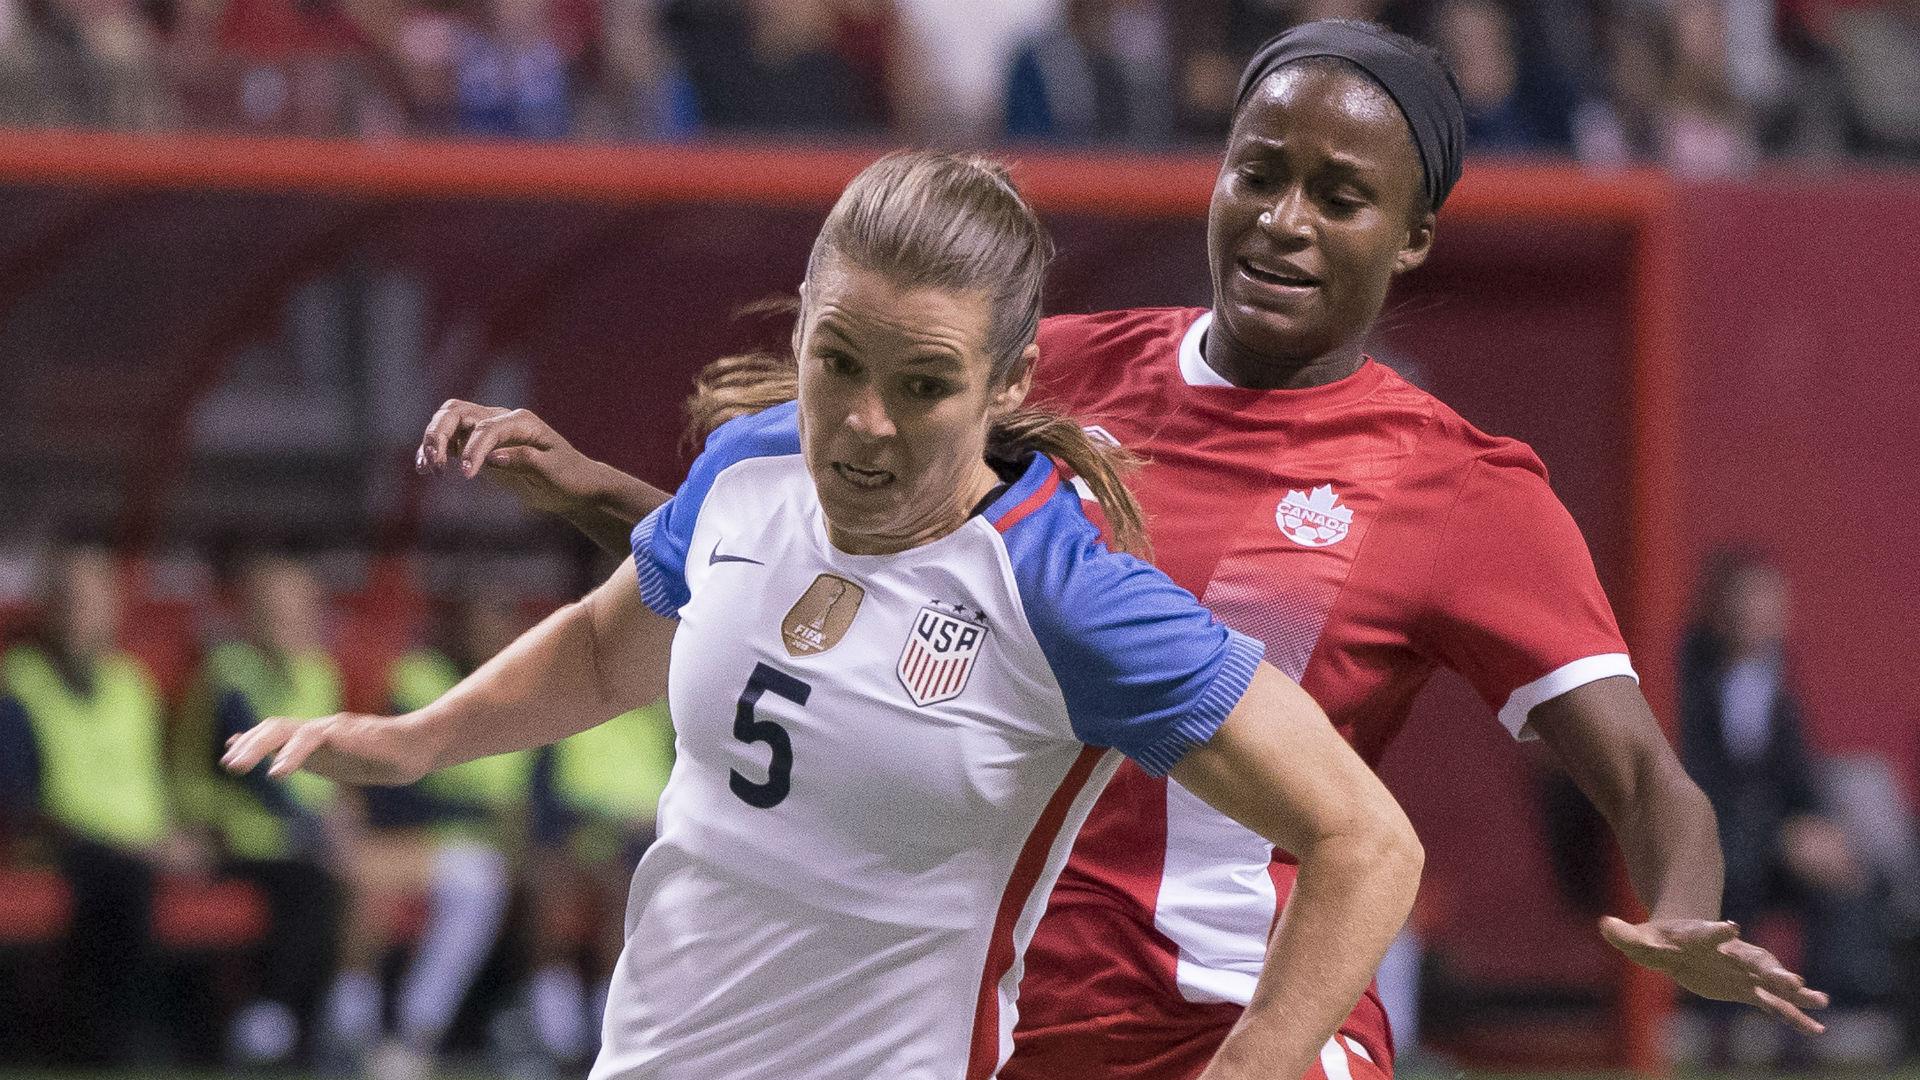 Kelley O'Hara U.S. women's national team